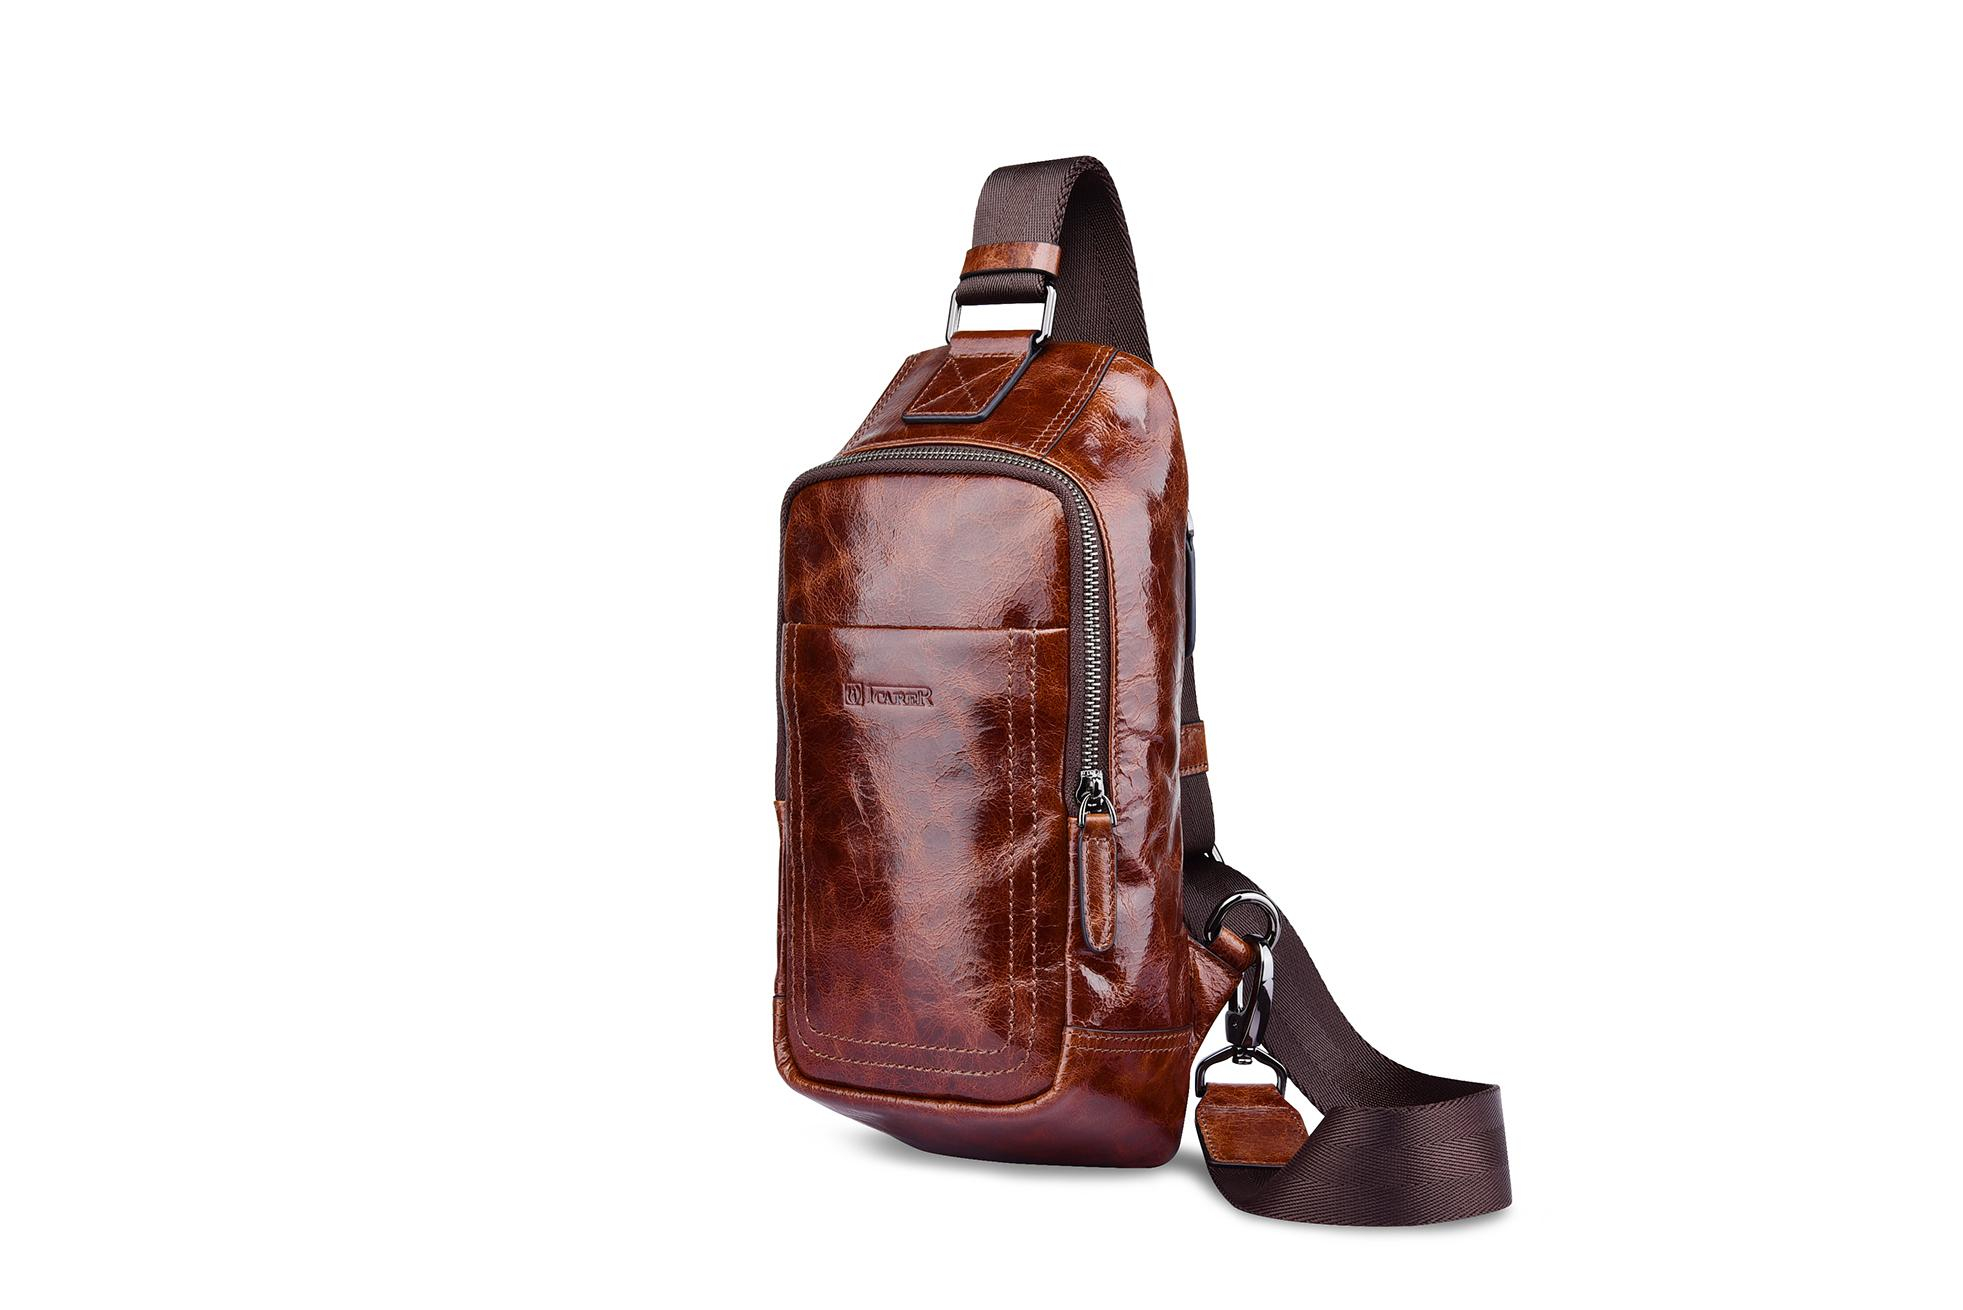 iCarer Vintage Oil Wax Real Leather Cross Body Bag 7